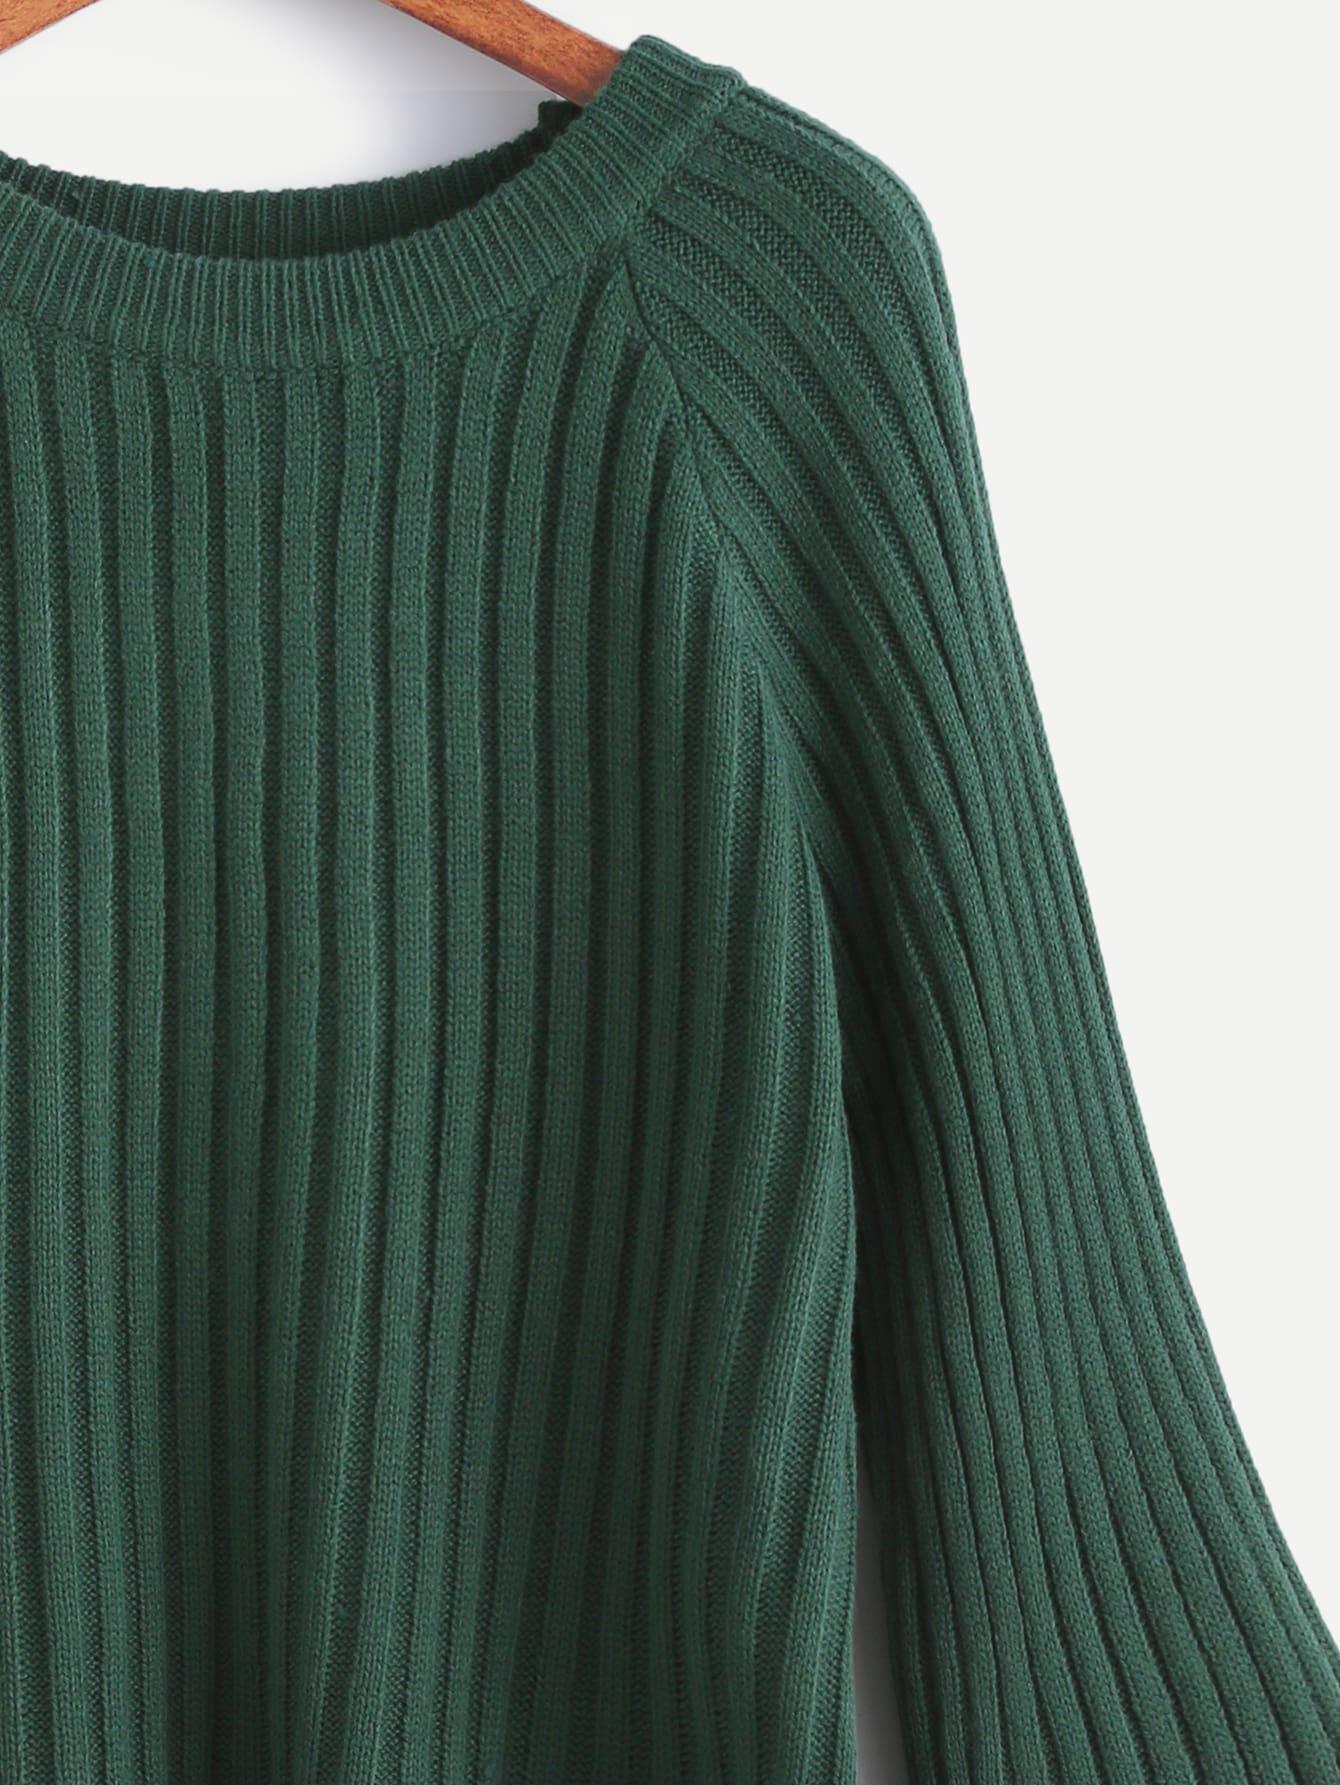 sweater161102004_2